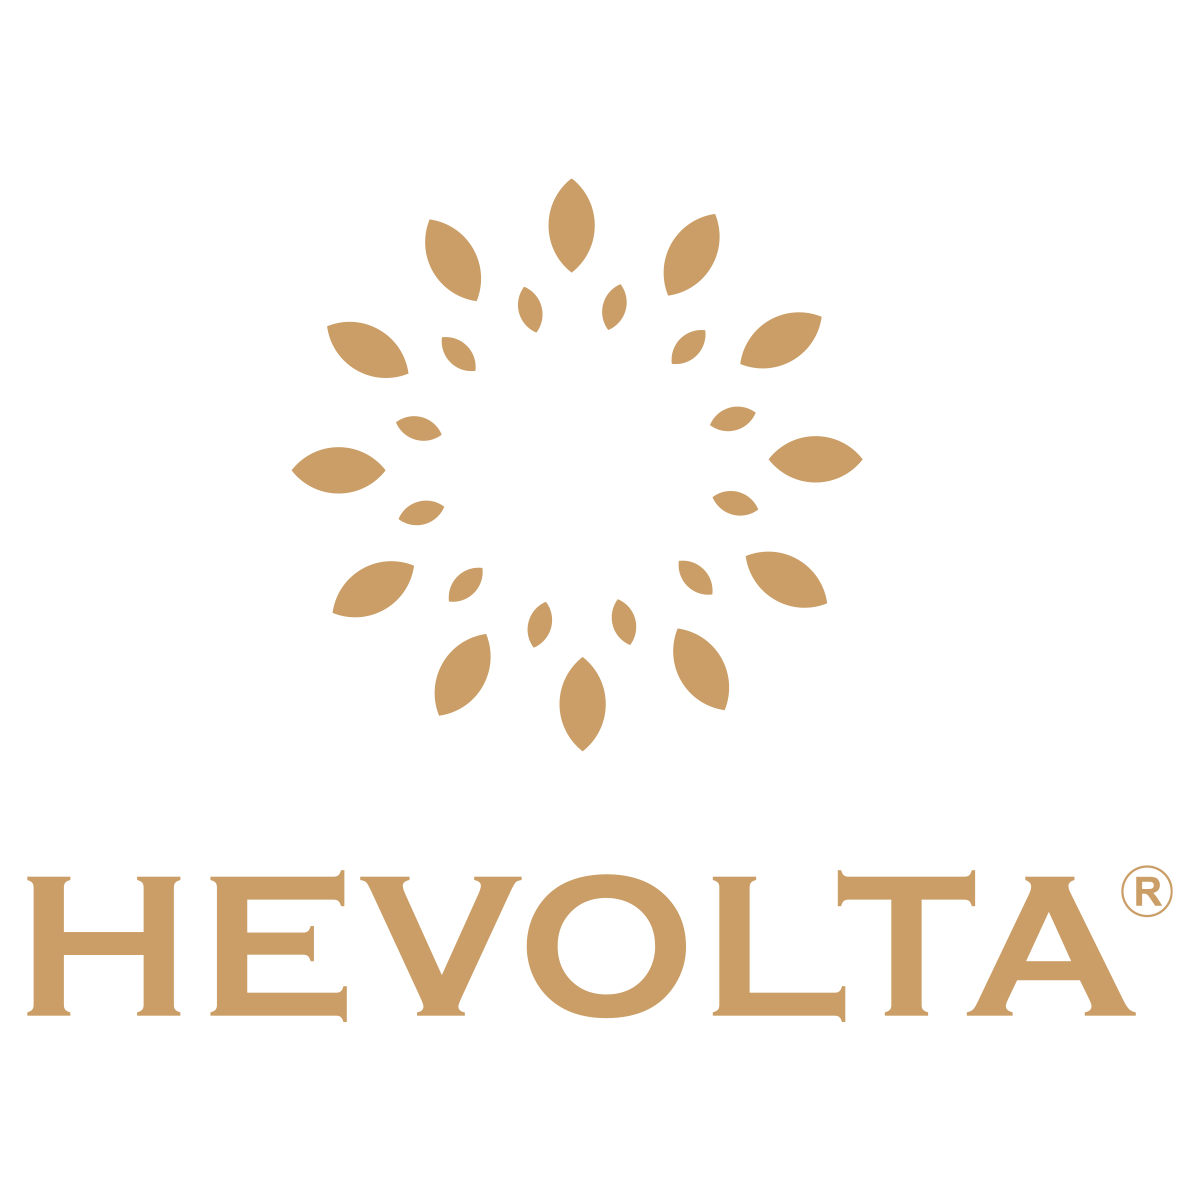 HEVOLTA